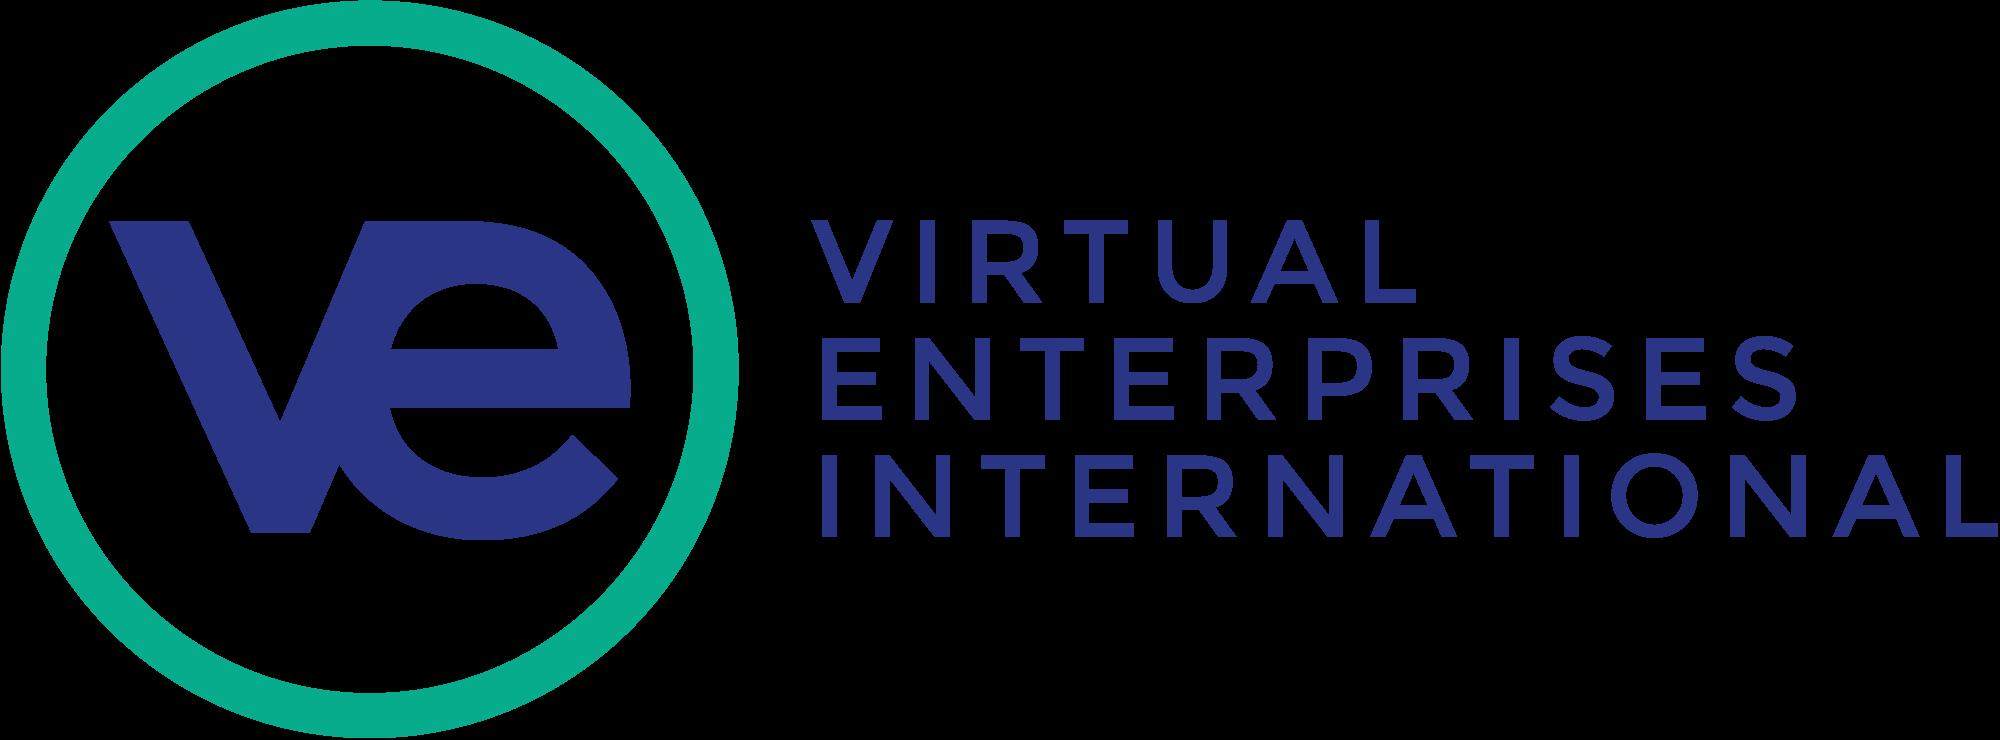 charitybuzz virtual enterprises international